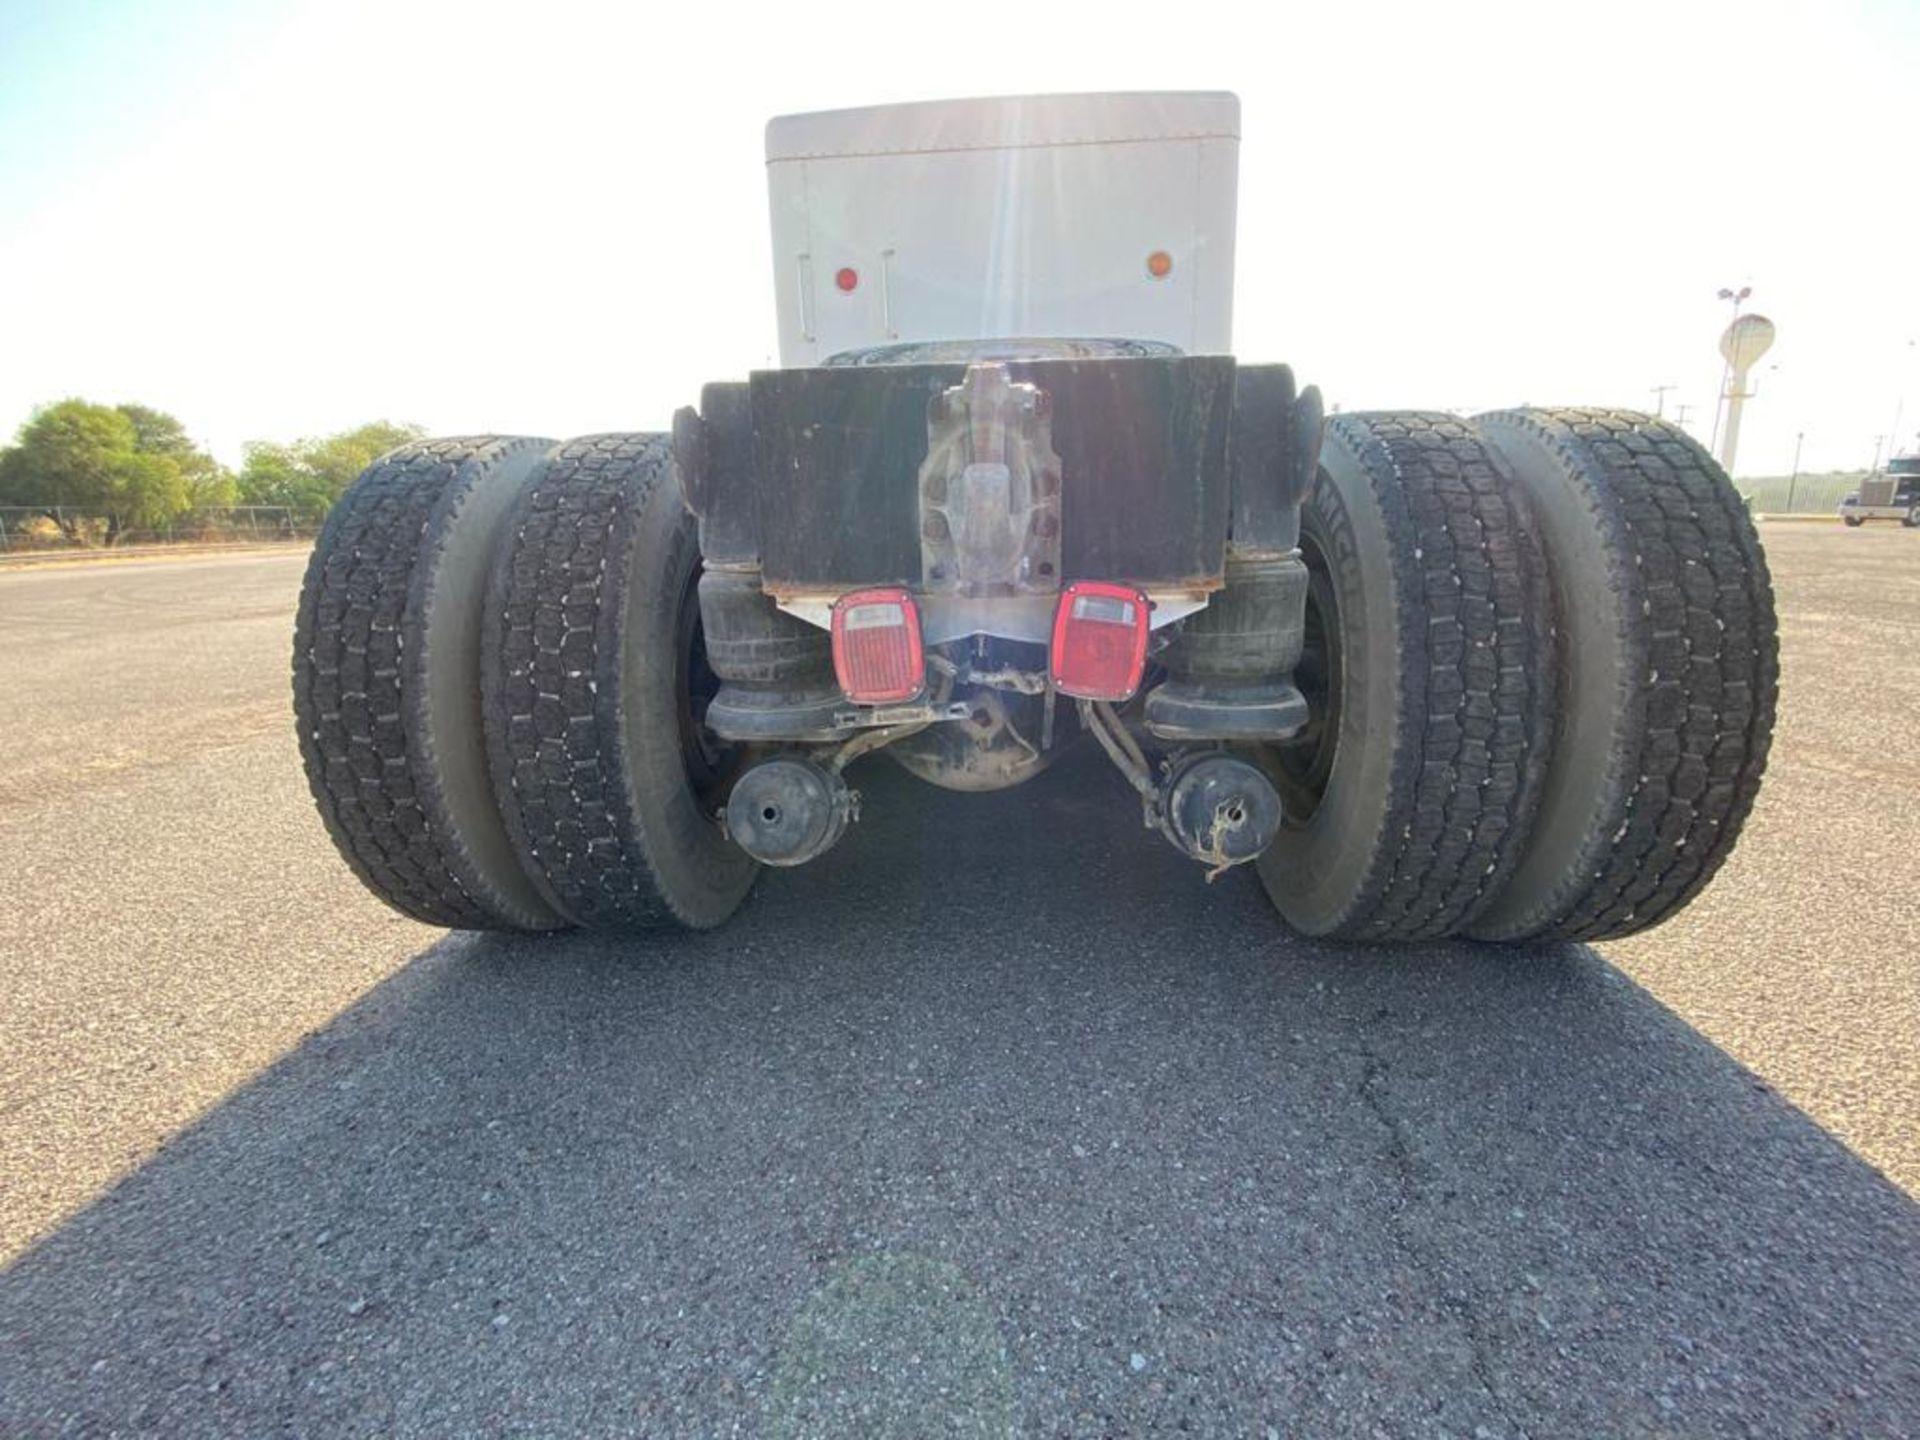 1998 Kenworth Sleeper Truck Tractor, standard transmission of 18 speeds - Image 21 of 55